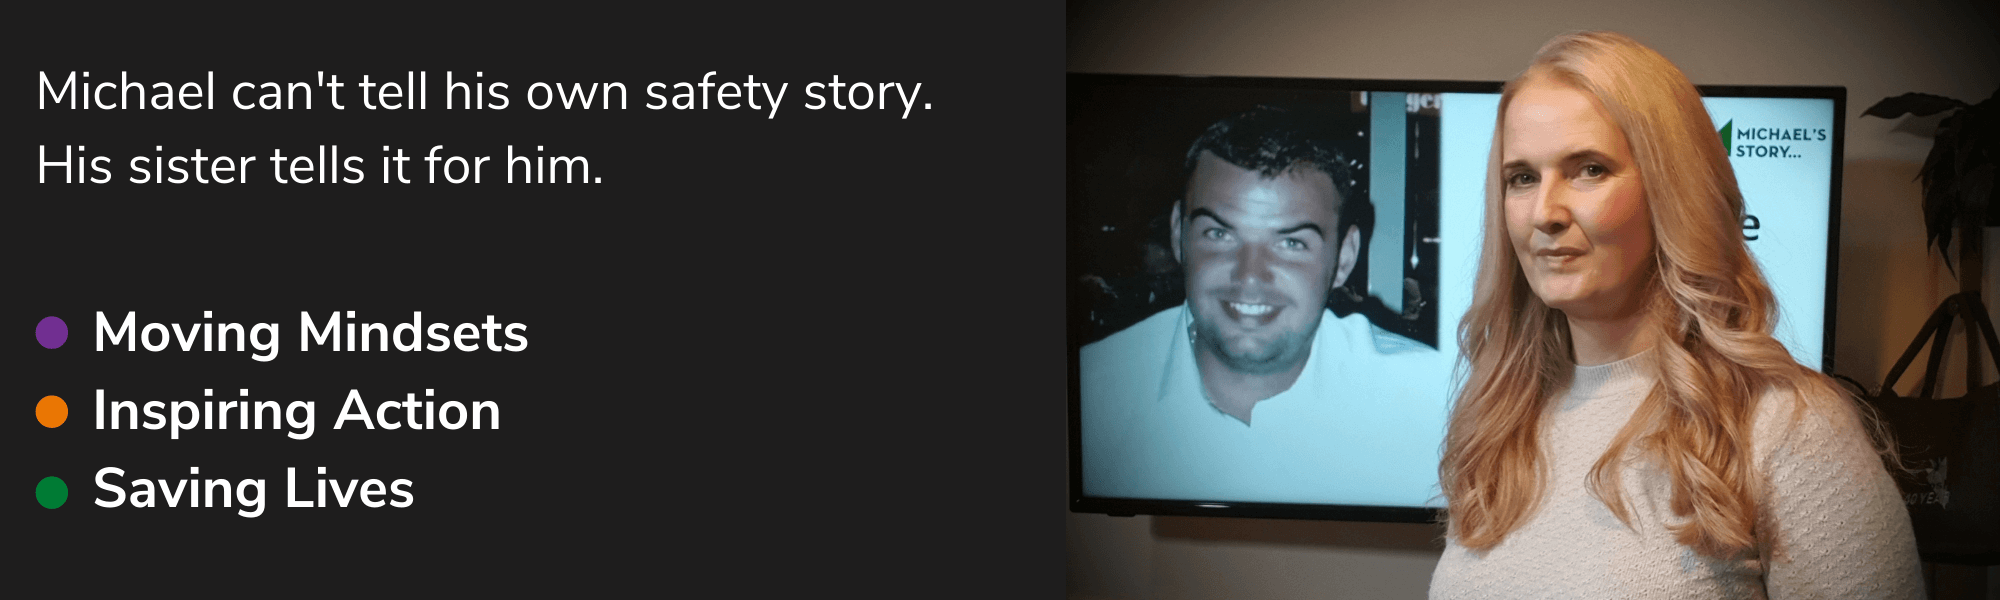 Motivational-Safety-Speaker